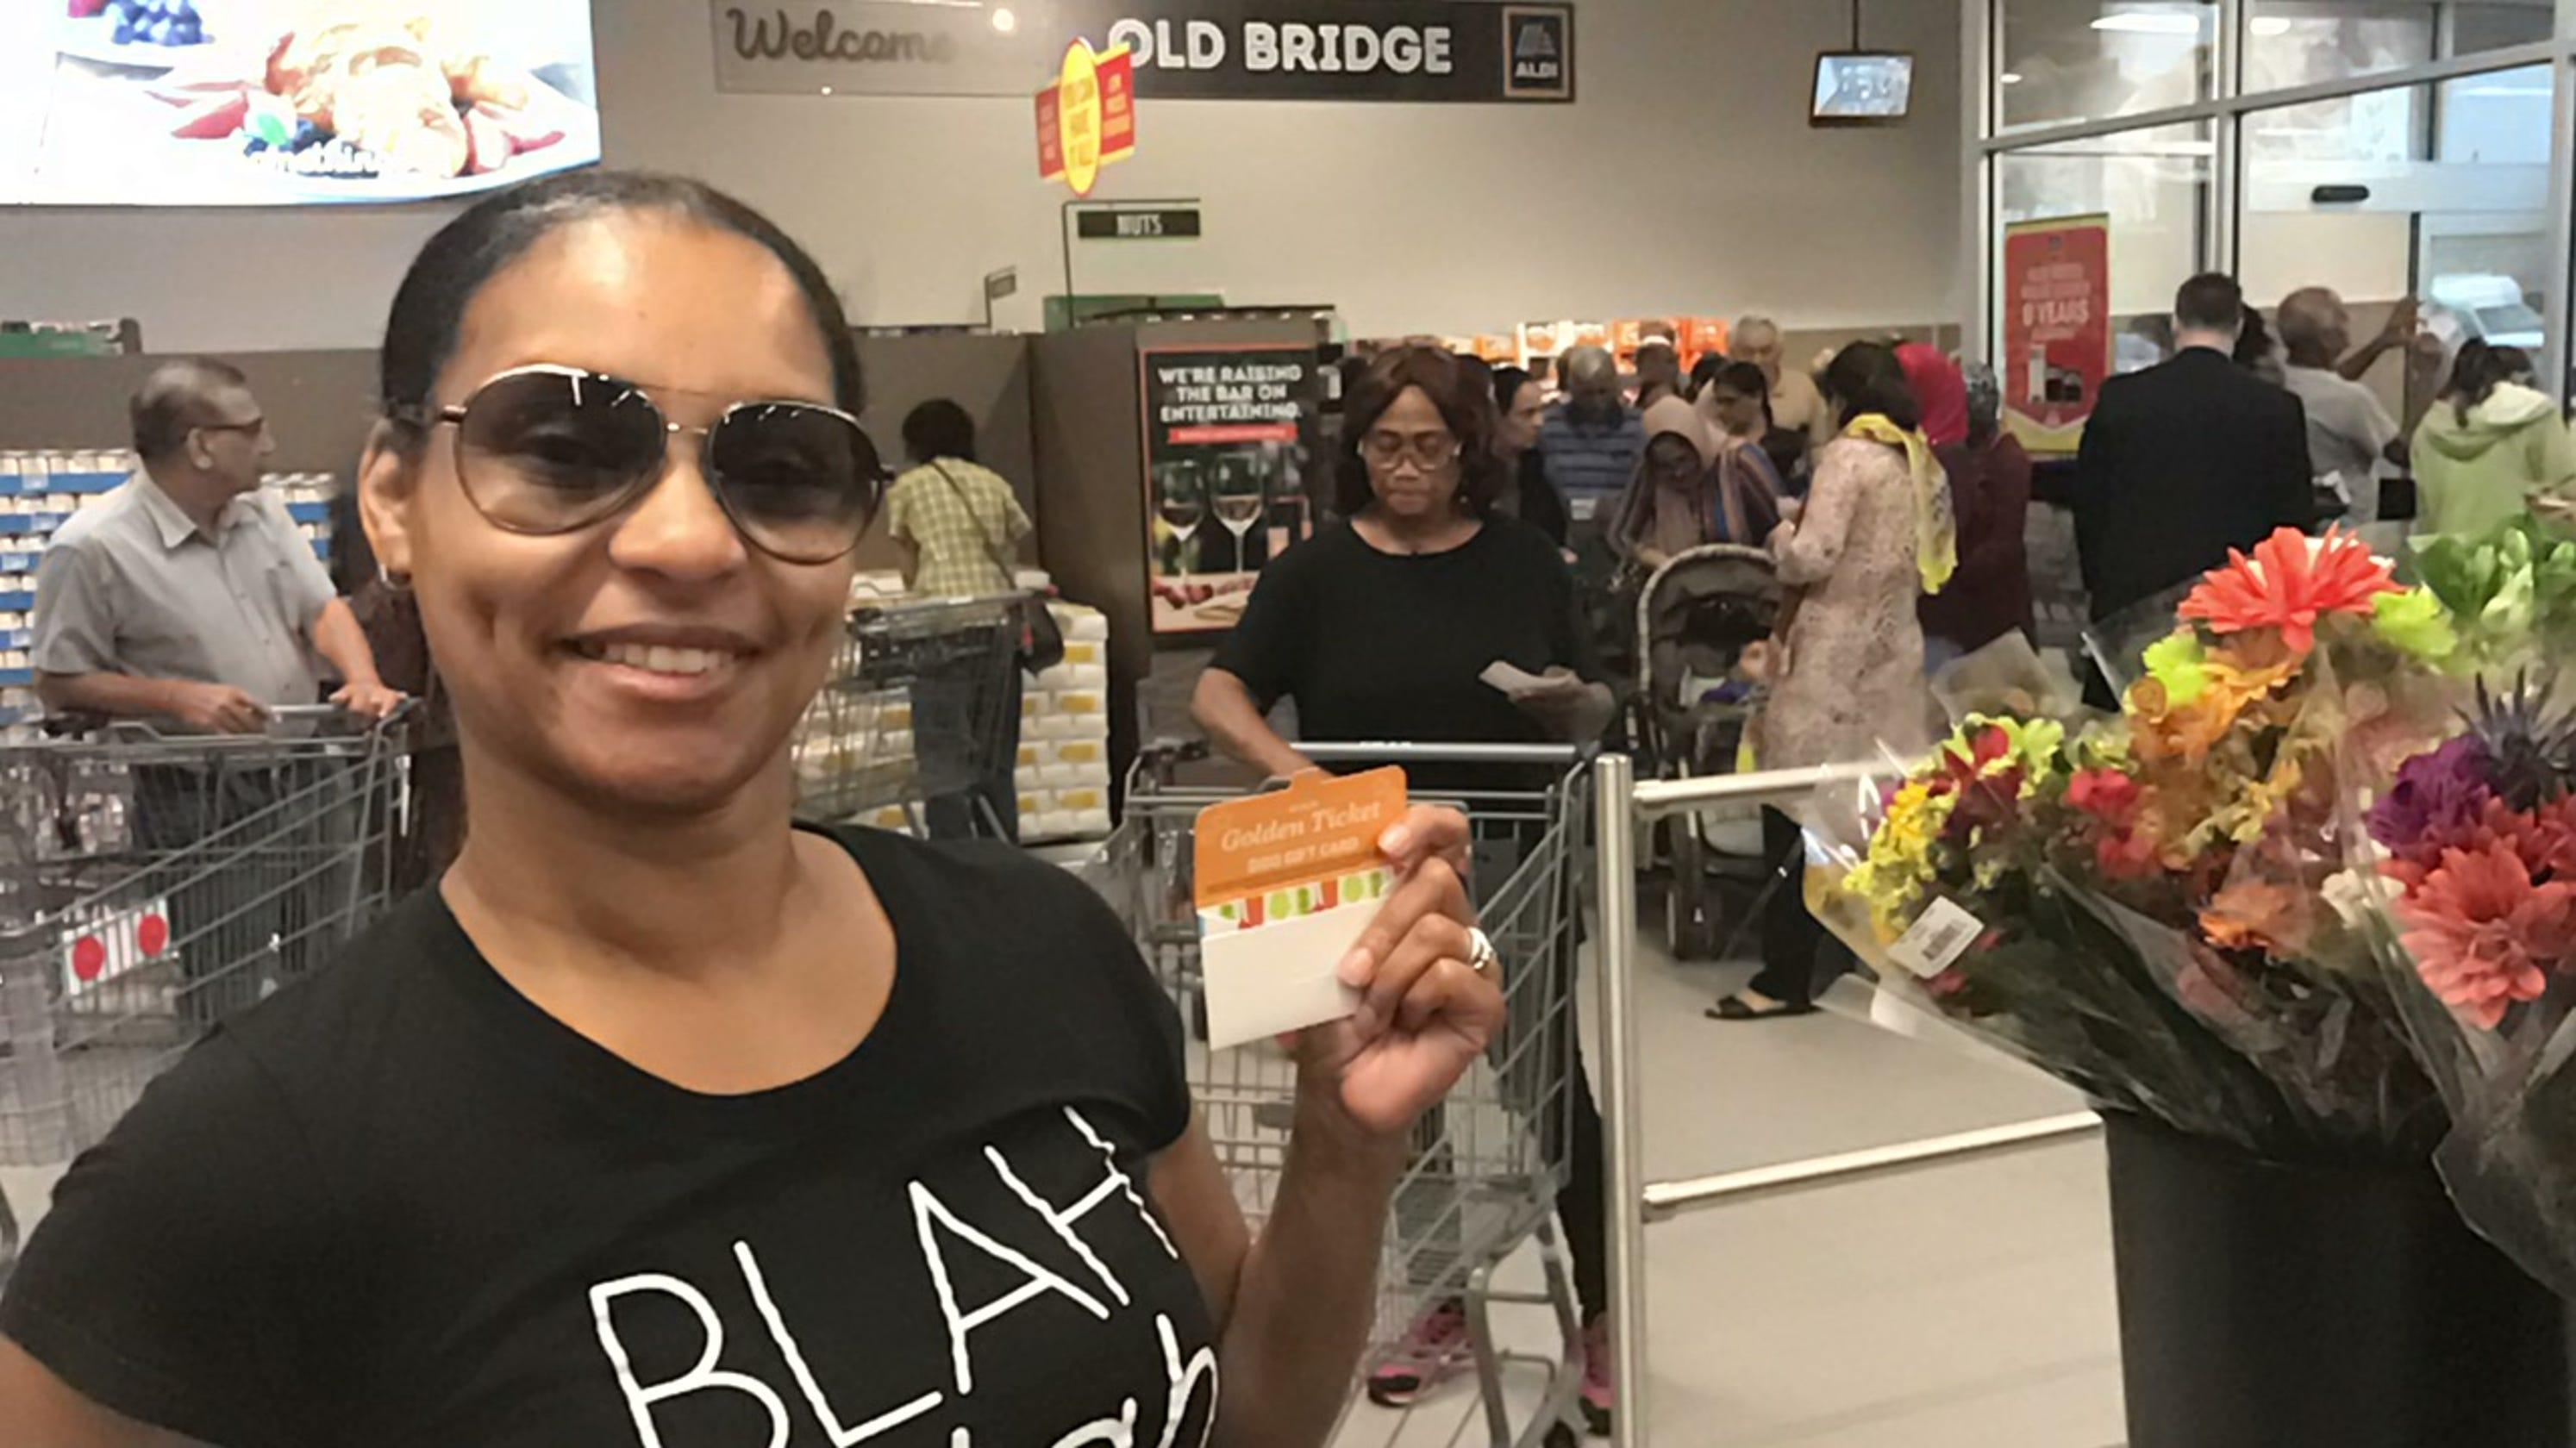 Aldi opens first Old Bridge store